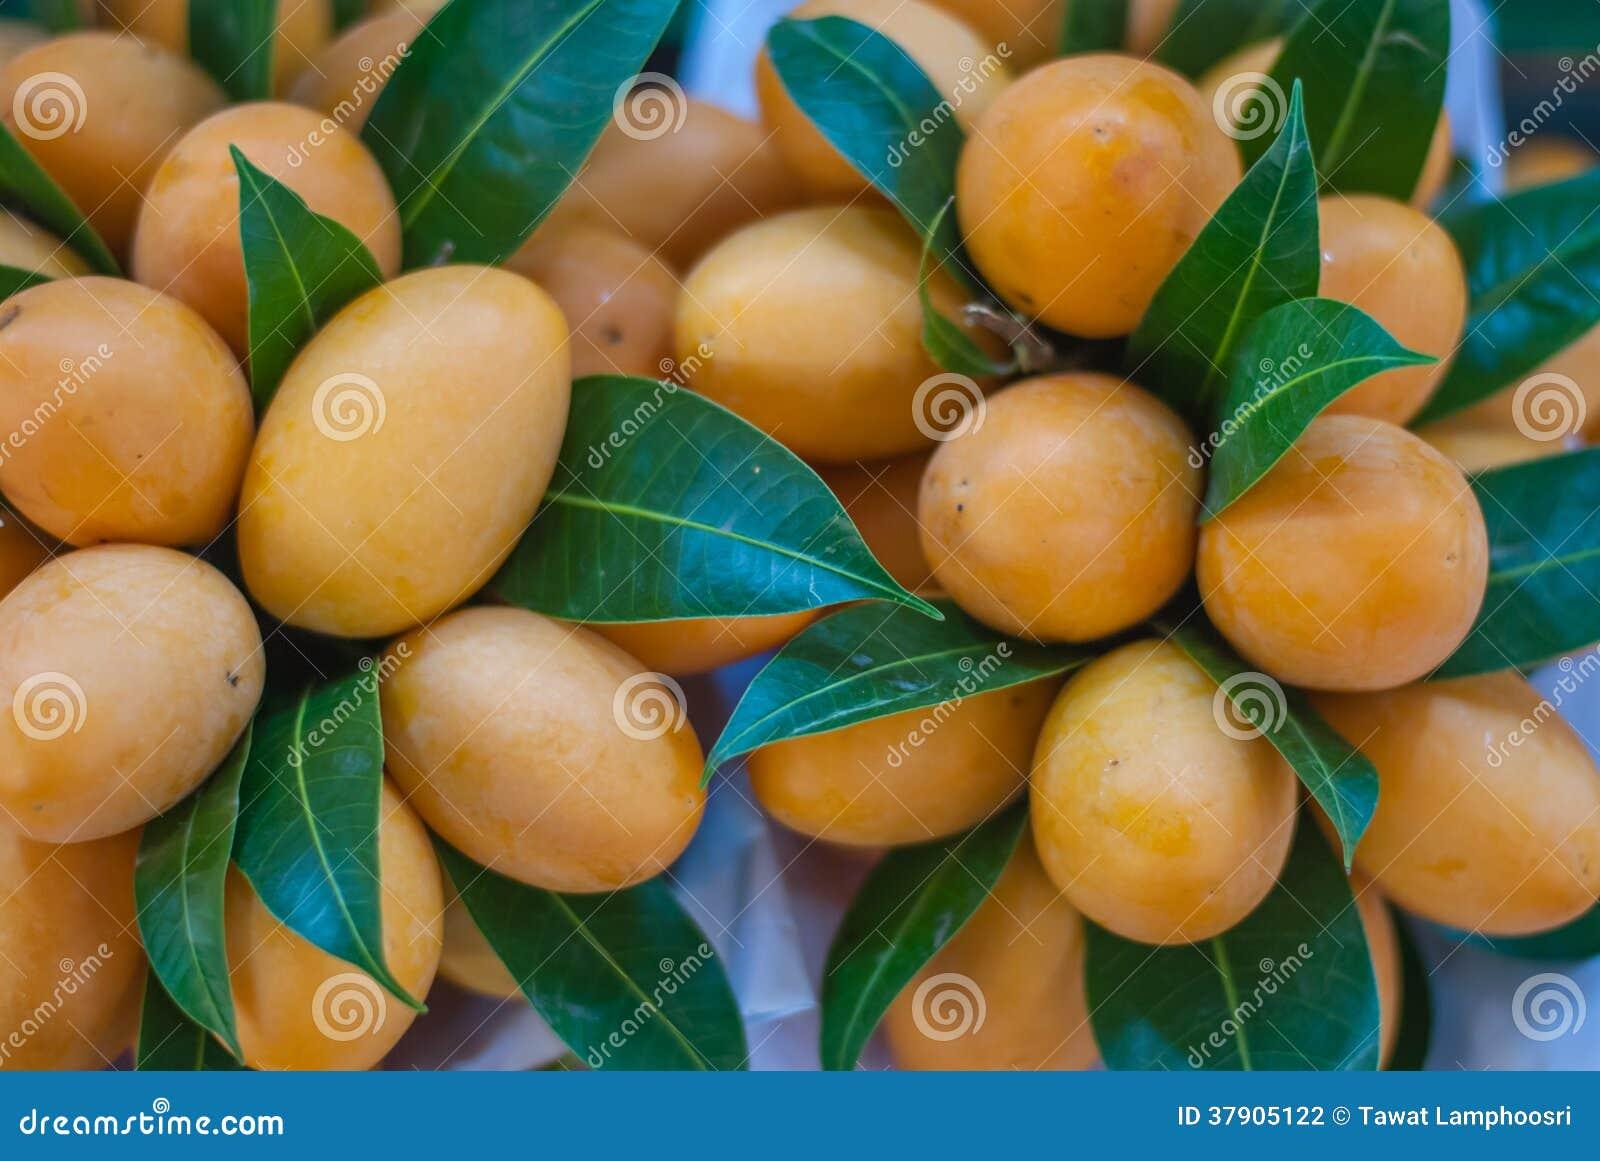 Marian Plum Or Plum Mango Stock Photo Image Of Dessert 37905122